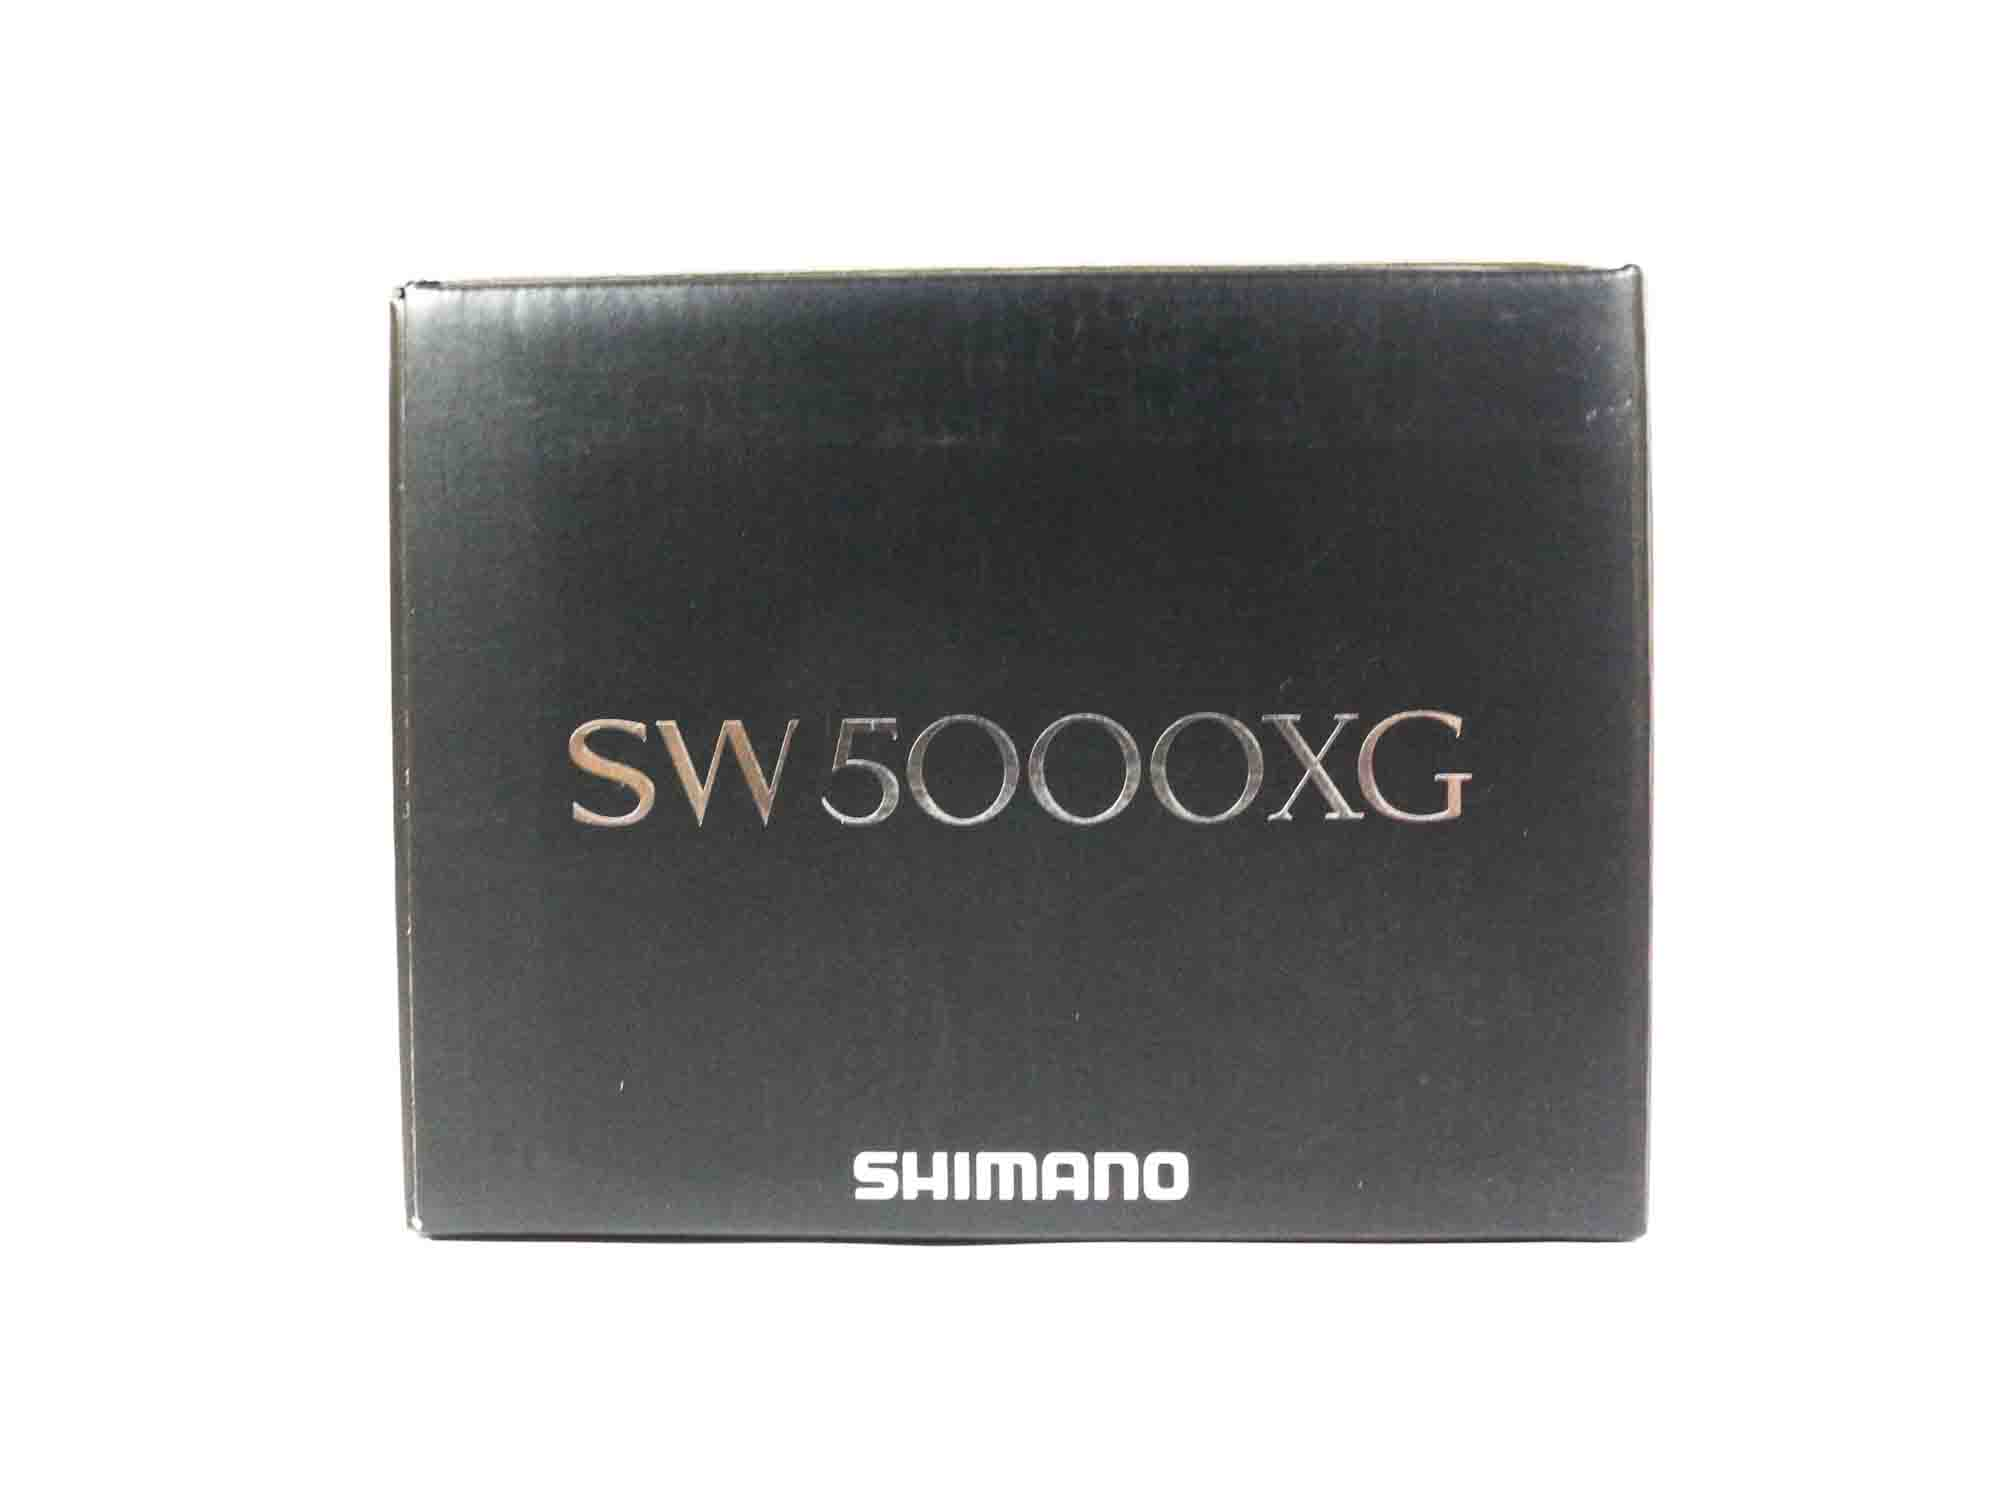 Shimano Reel Spinning Stella STLSW5000XGC SW 5000 XG 2020 (2170)